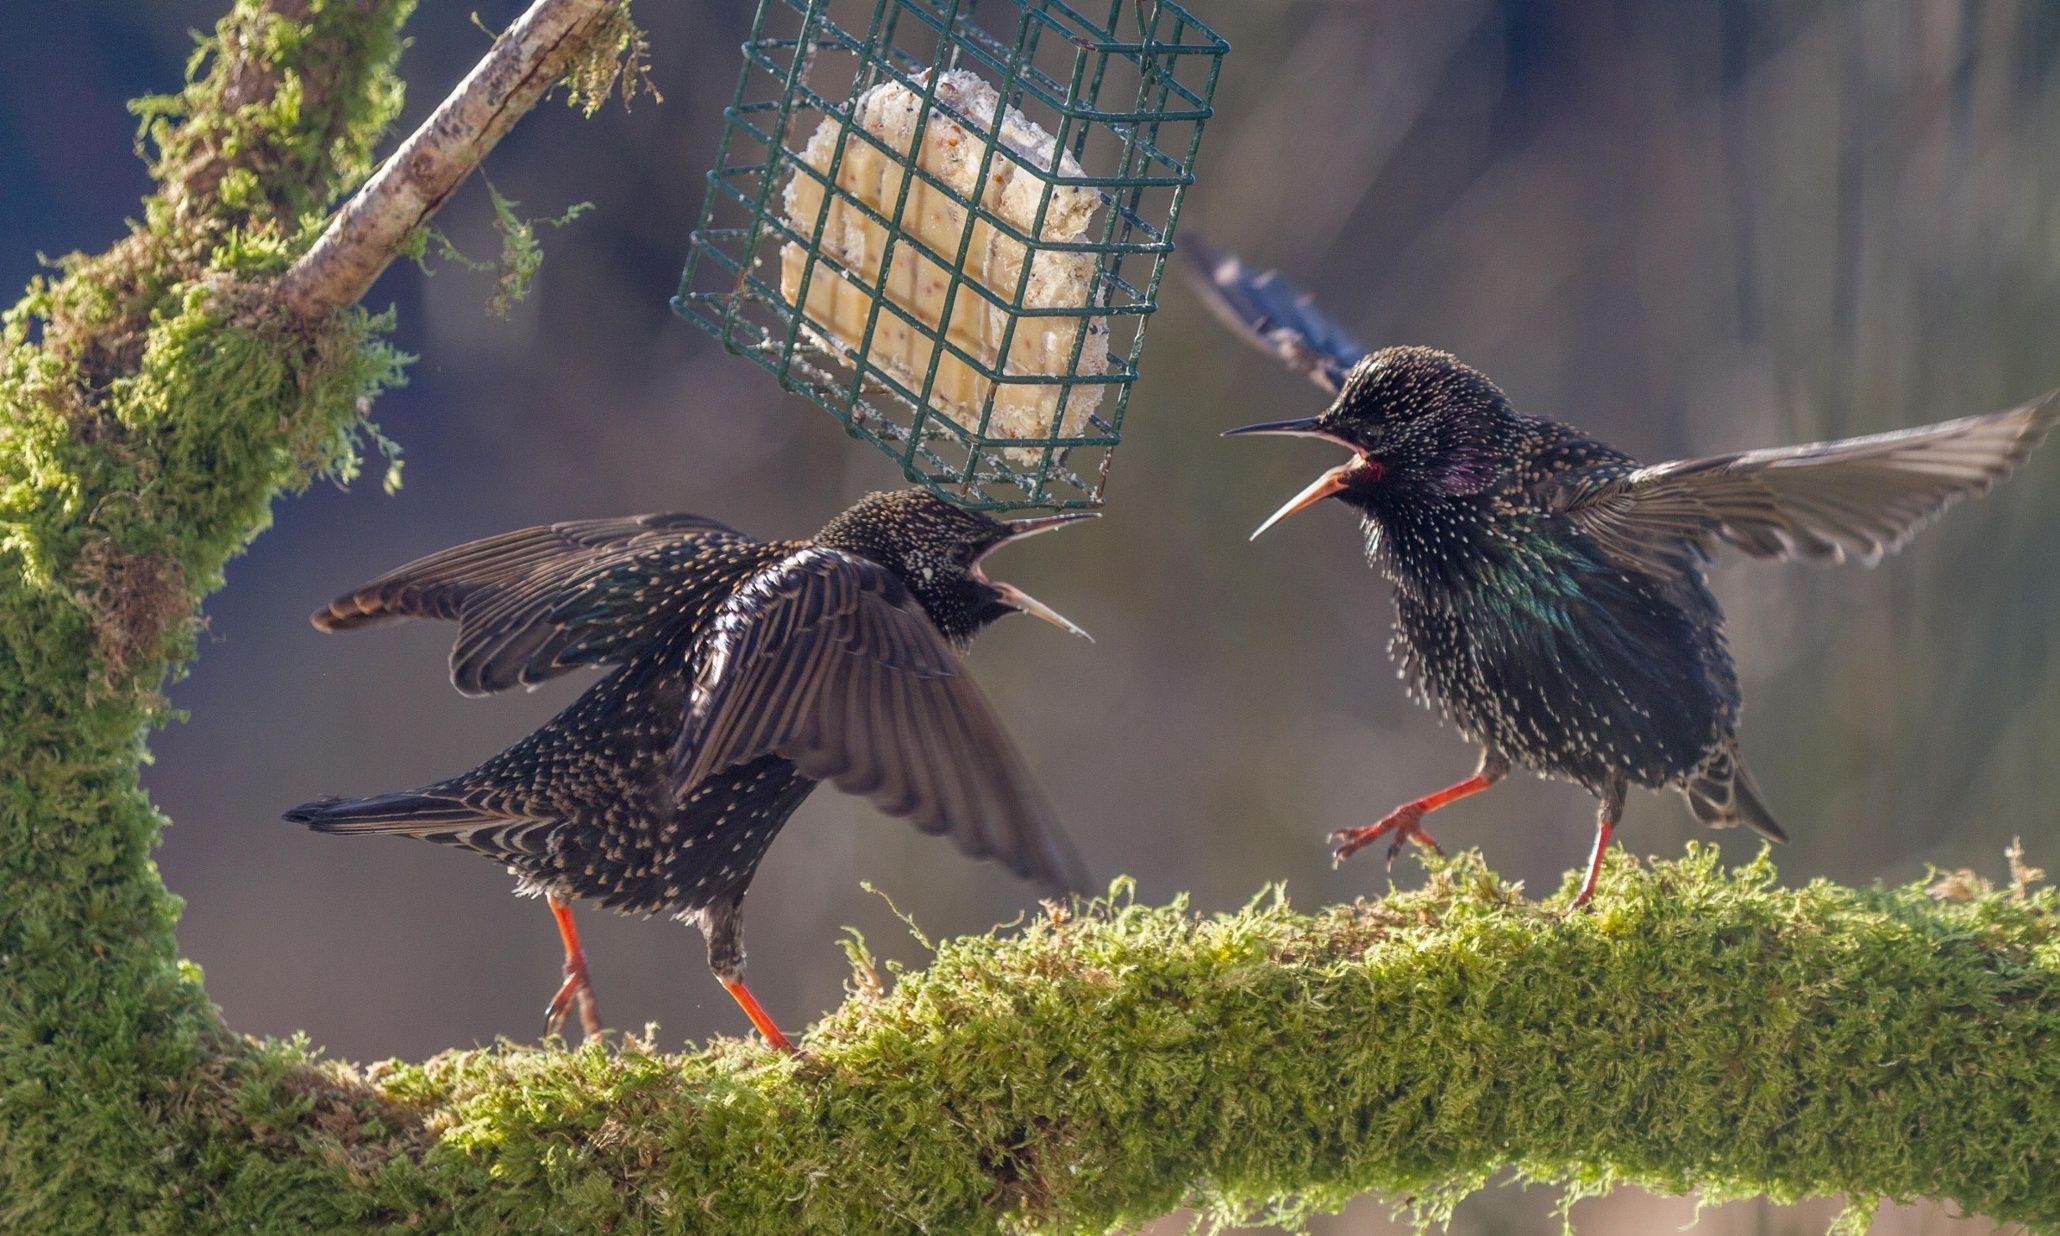 Rspb S Big Garden Bird Watch Confirms Many Species Still Declining Big Garden Bird Garden Bird